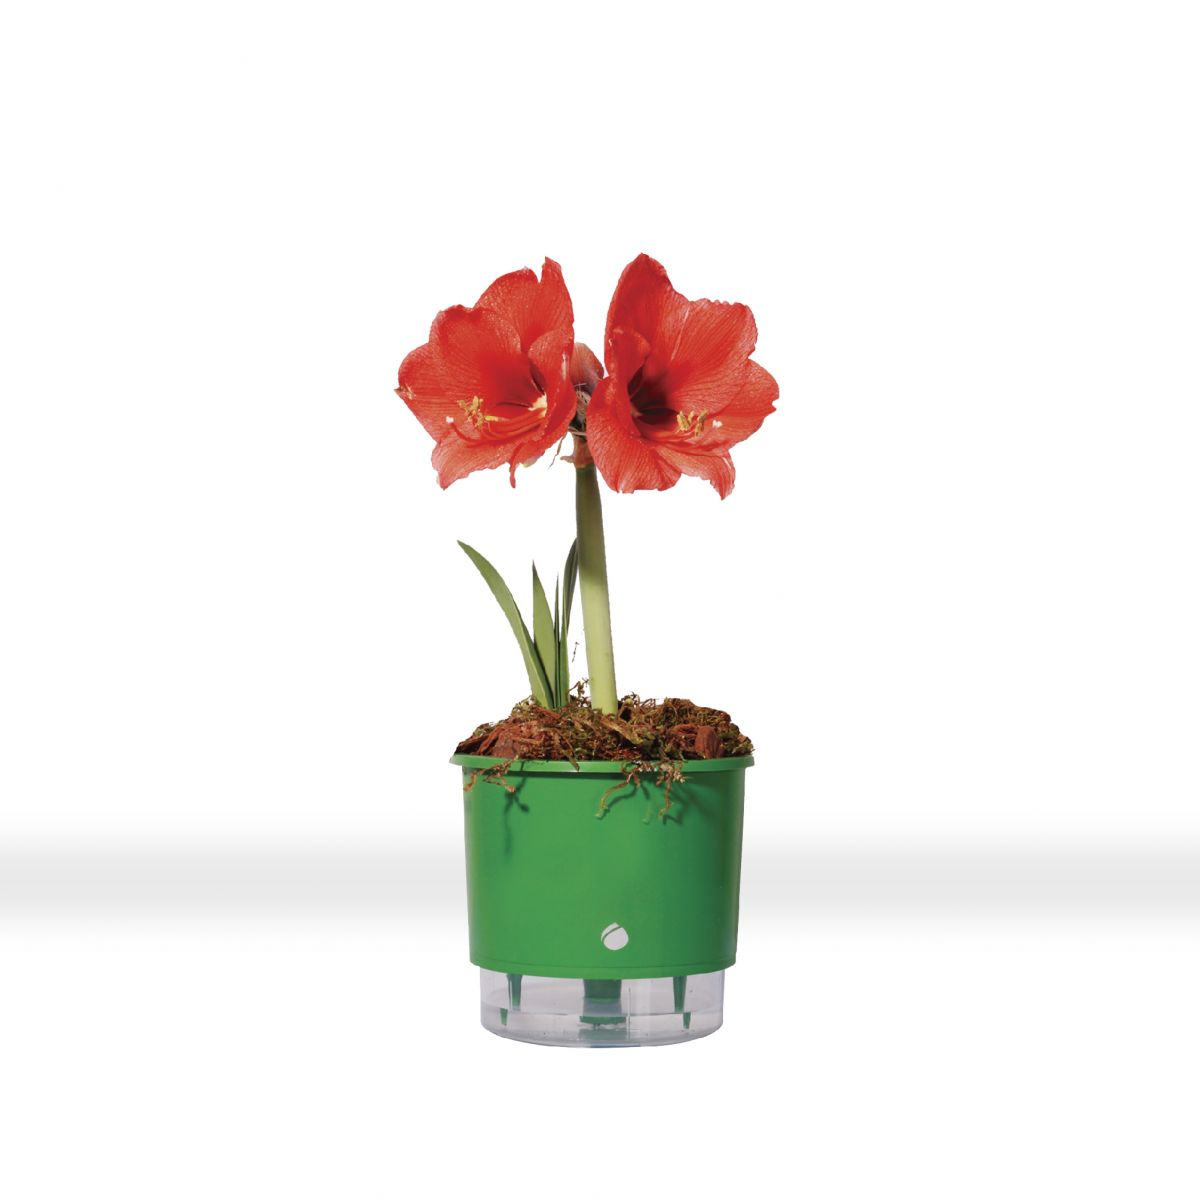 Vaso autoirrigável Raiz MÉDIO 16 cm X 14 cm